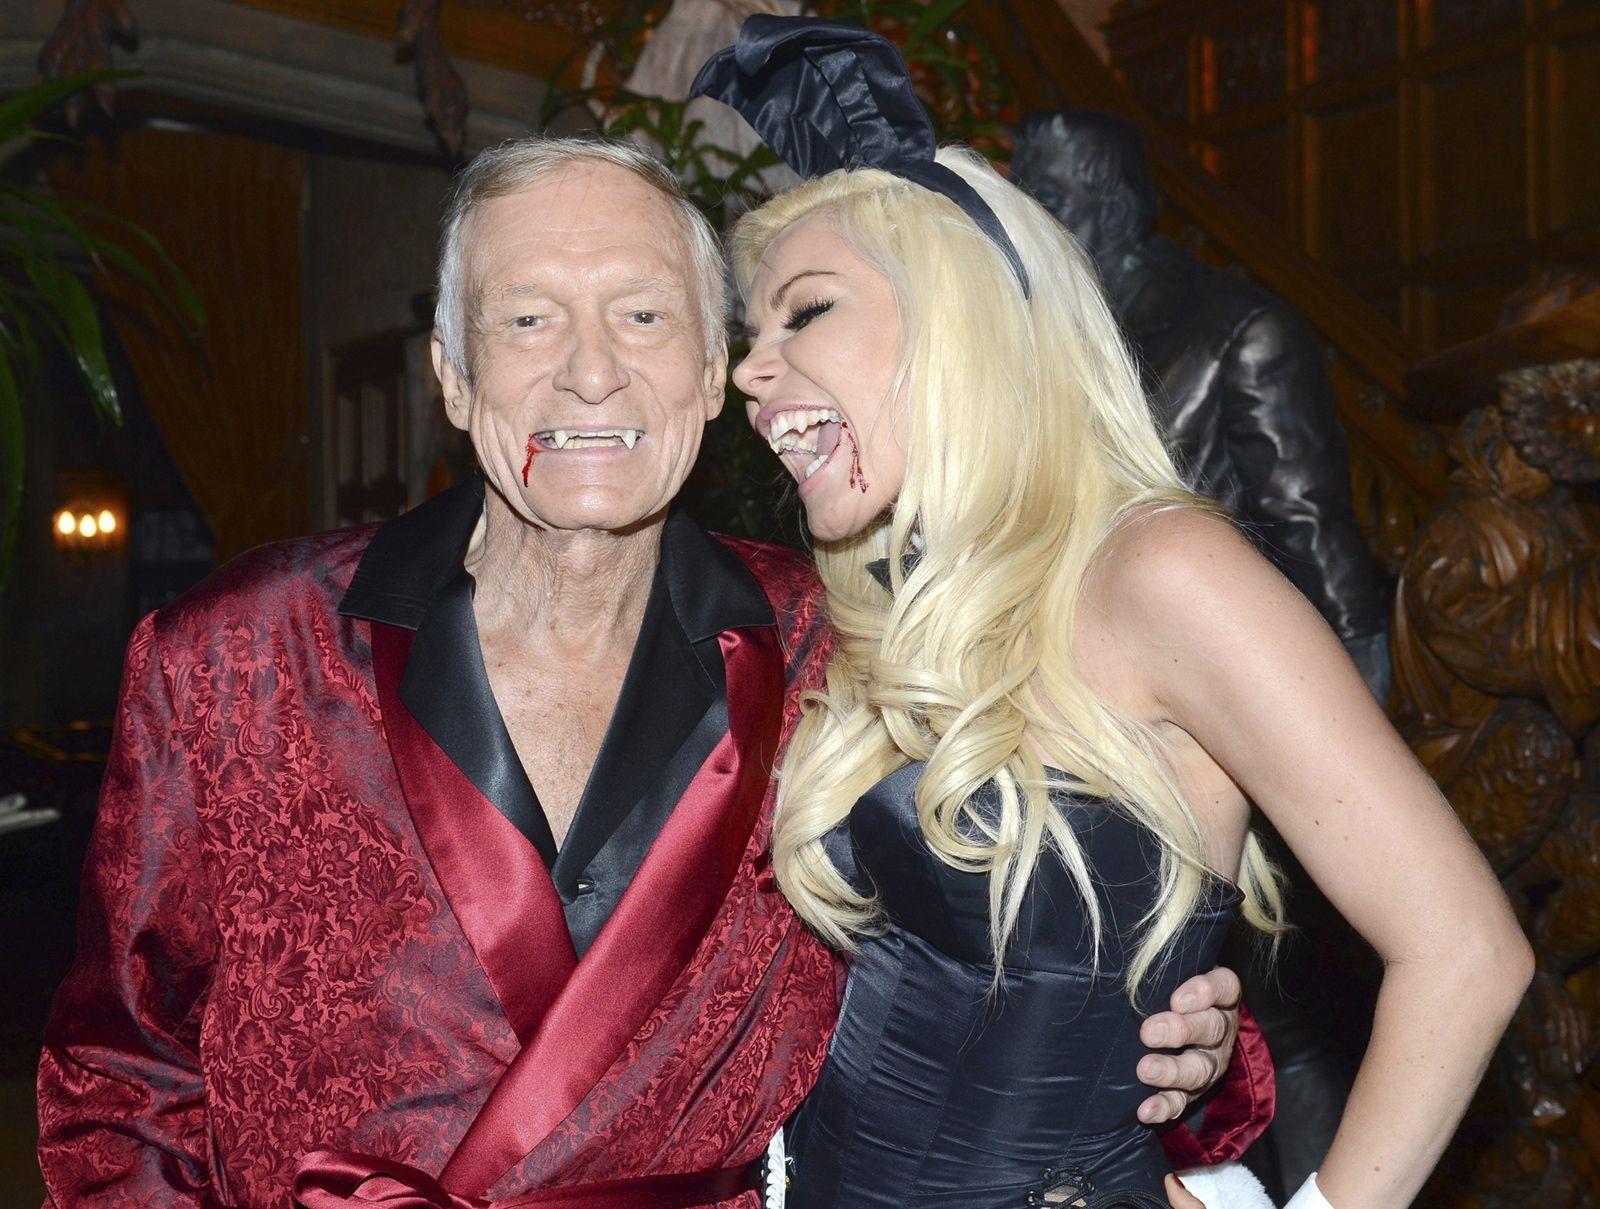 Celeb Pix Inside Hugh Hefners Halloween Party At Playboy Mansion